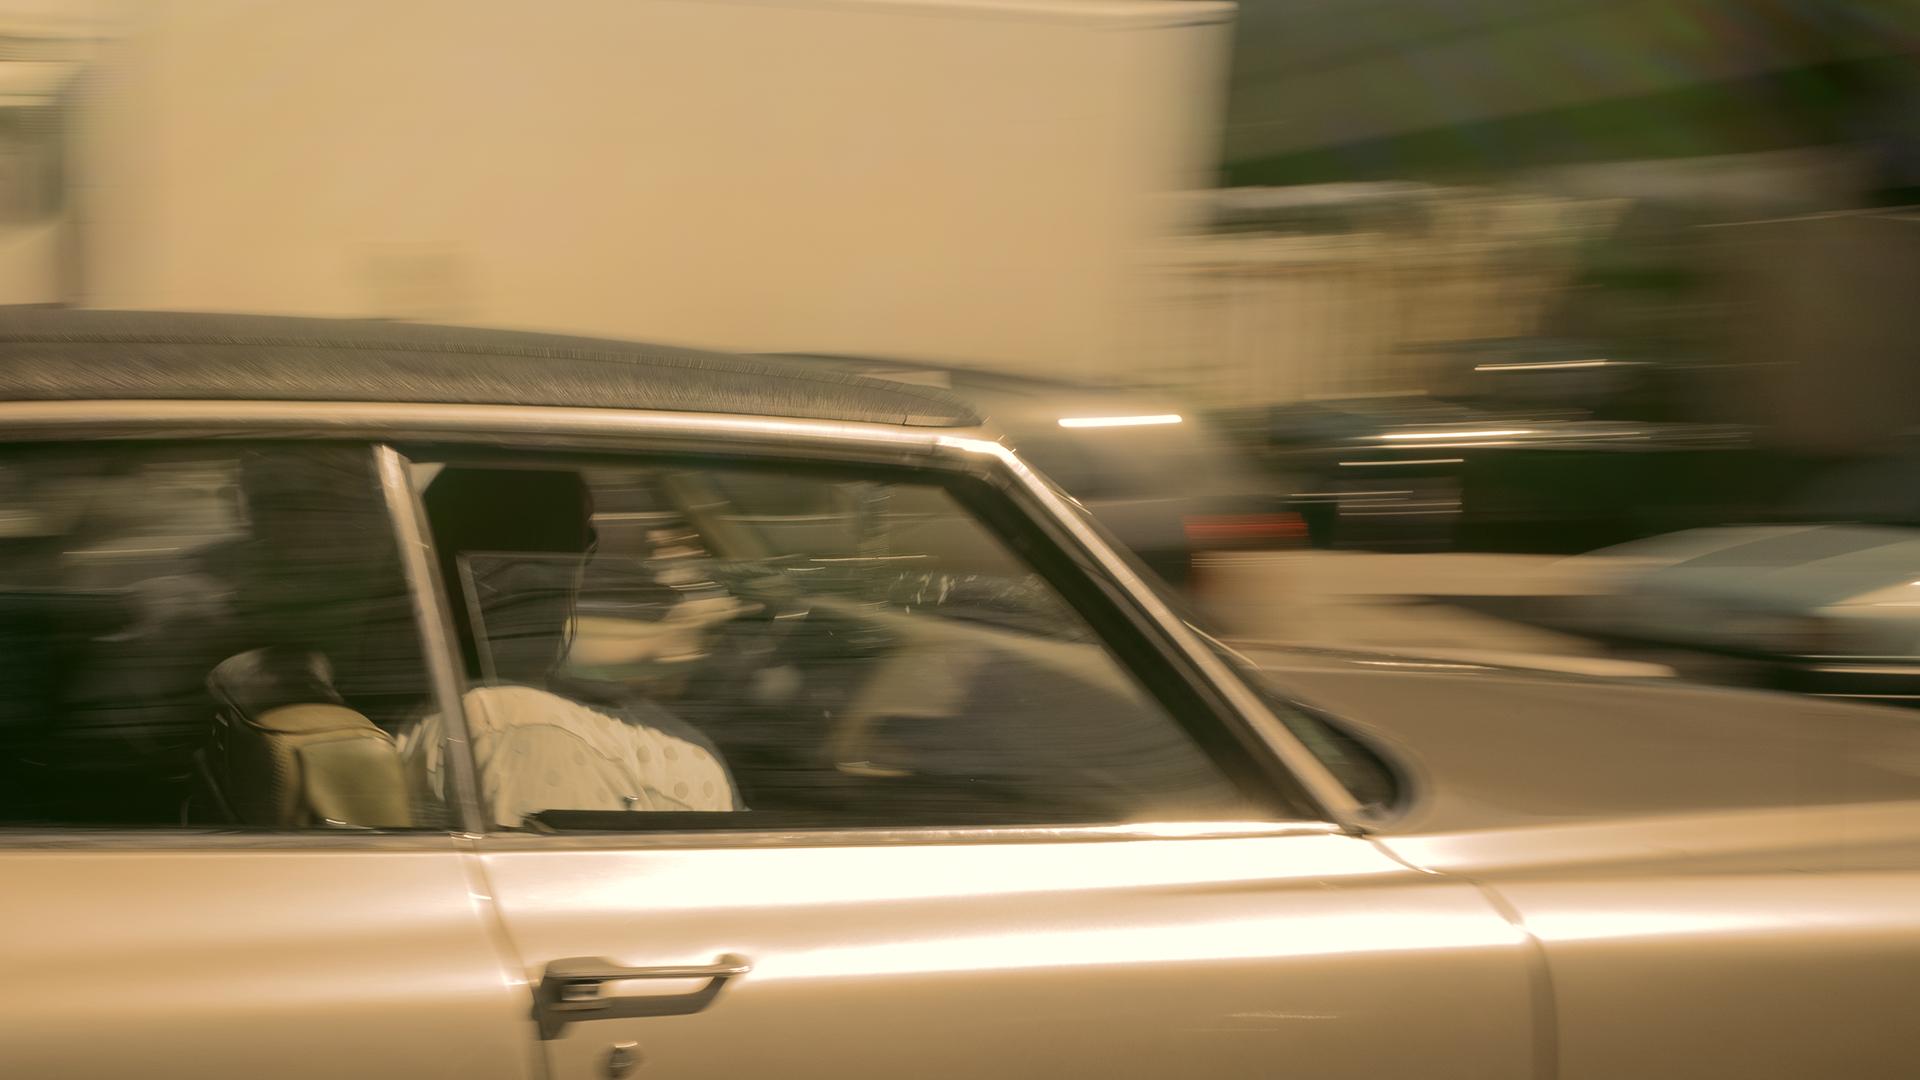 ONN_Cars_FleaMarket_09